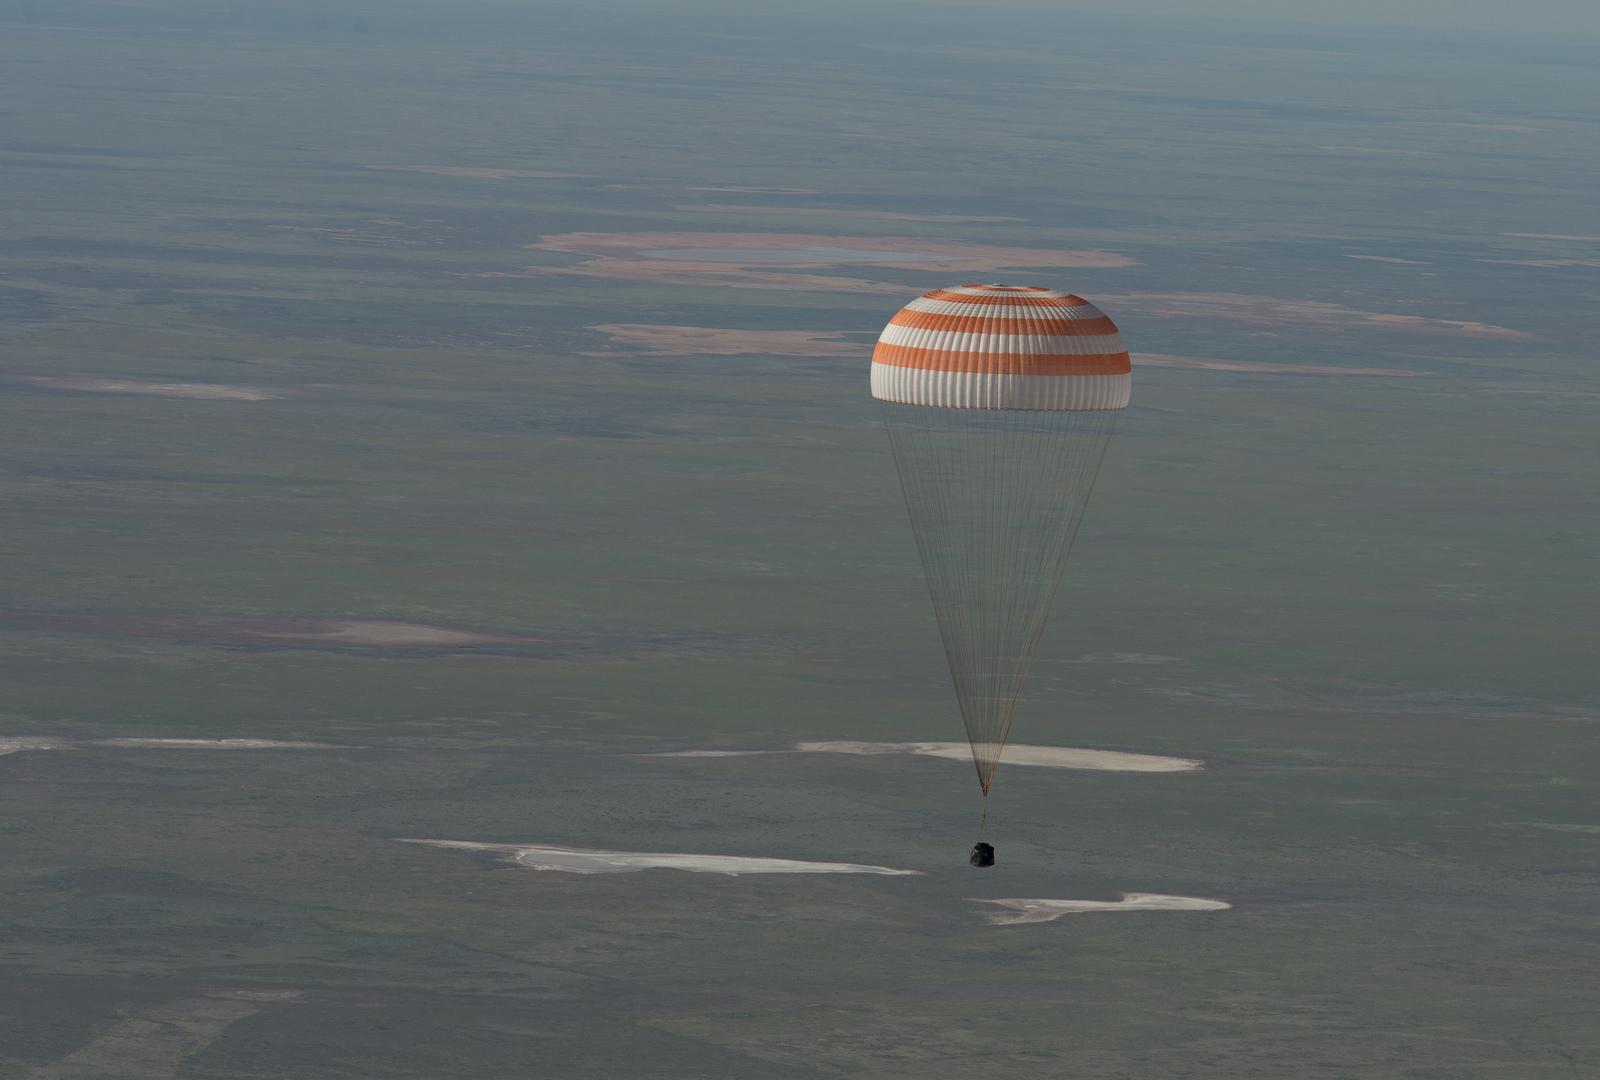 russian spacecraft landing - photo #36